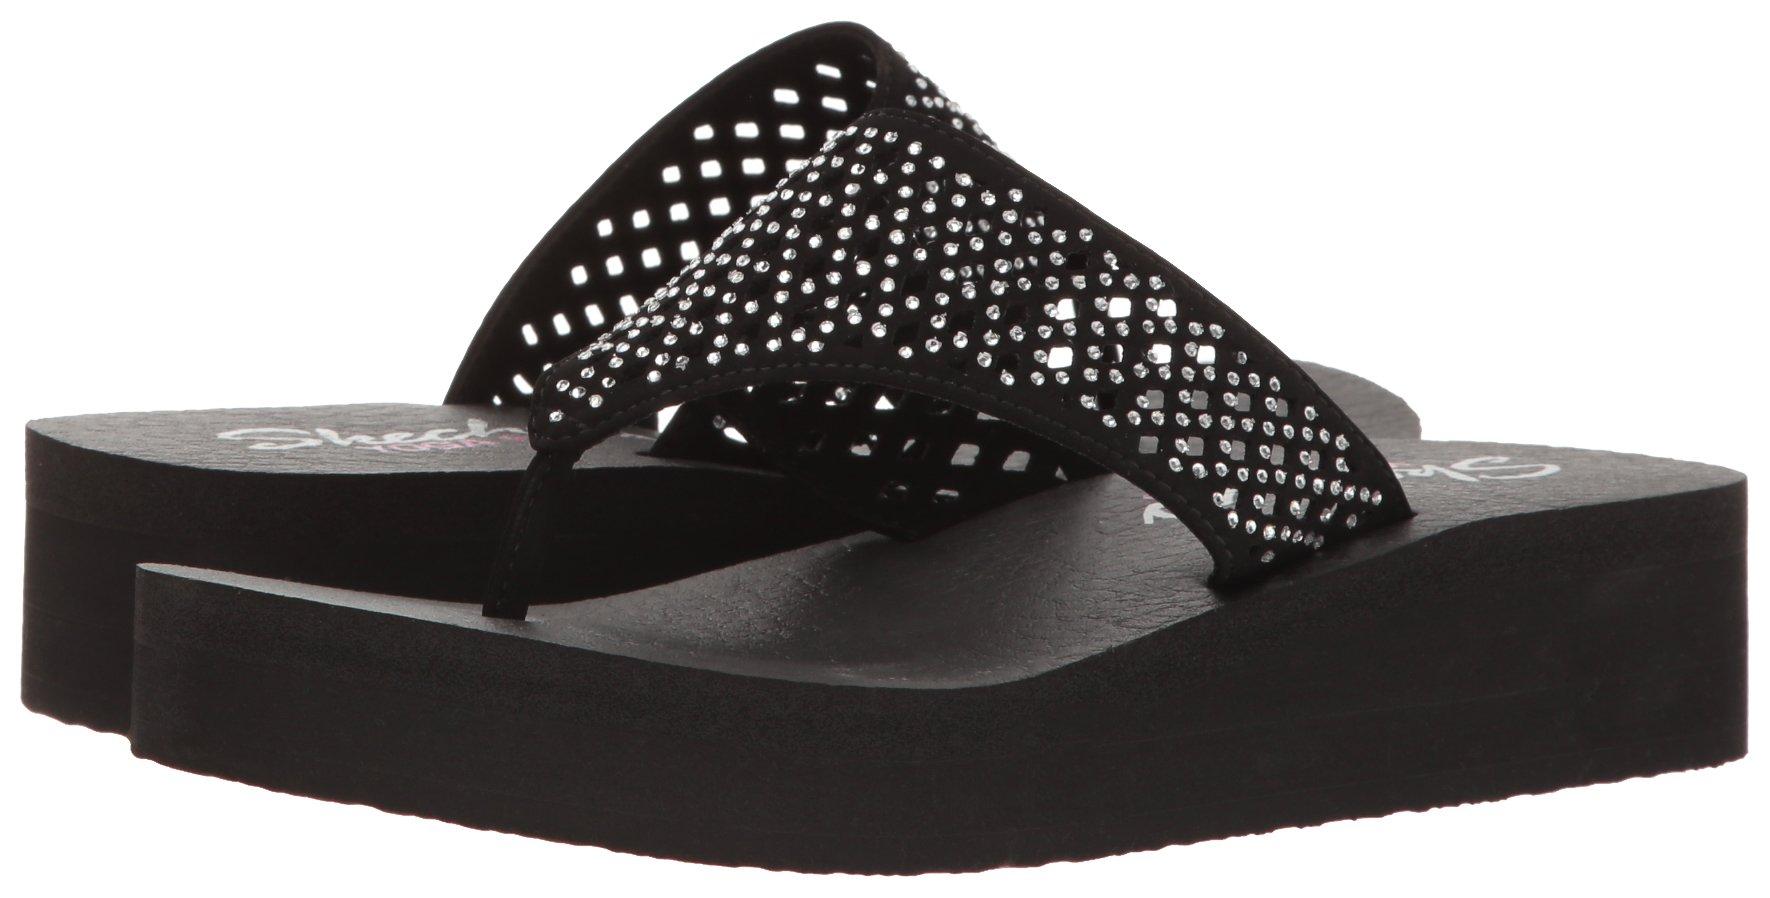 Skechers Cali Women's Vinyasa Flow Wedge Sandal, Black Cutout, 6 B(M) US by Skechers (Image #6)